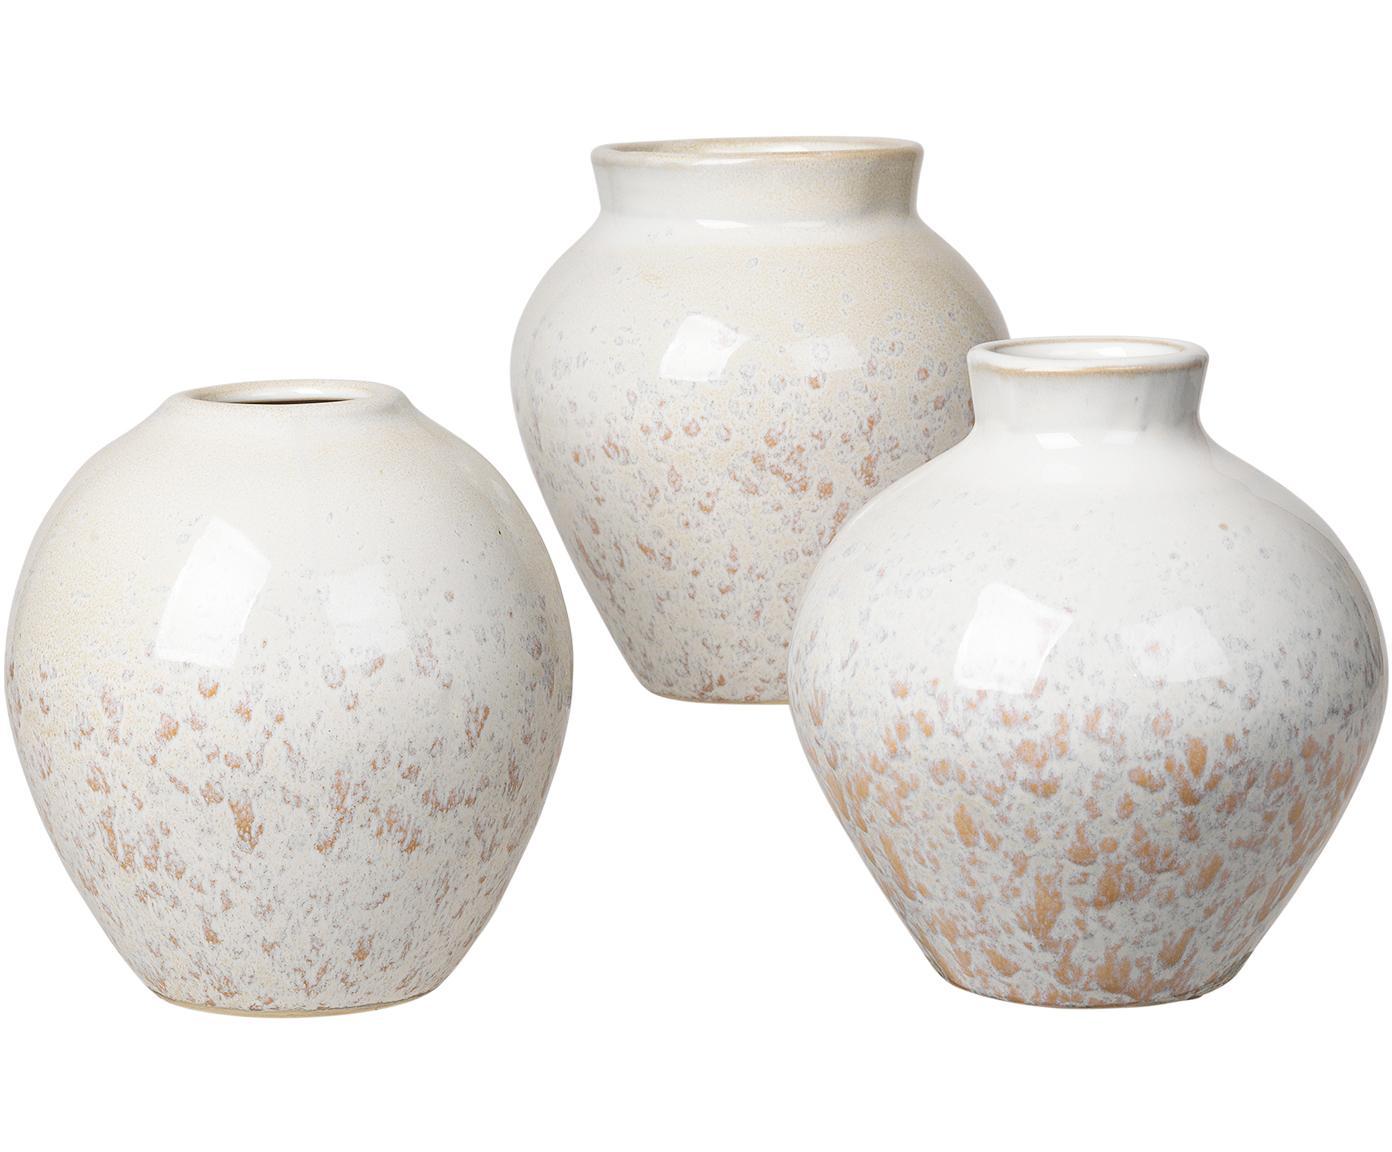 Vasen-Set Ingrid aus Keramik, 3-tlg. , Keramik, Weiß, Beigetöne, Ø 14 x H 14 cm